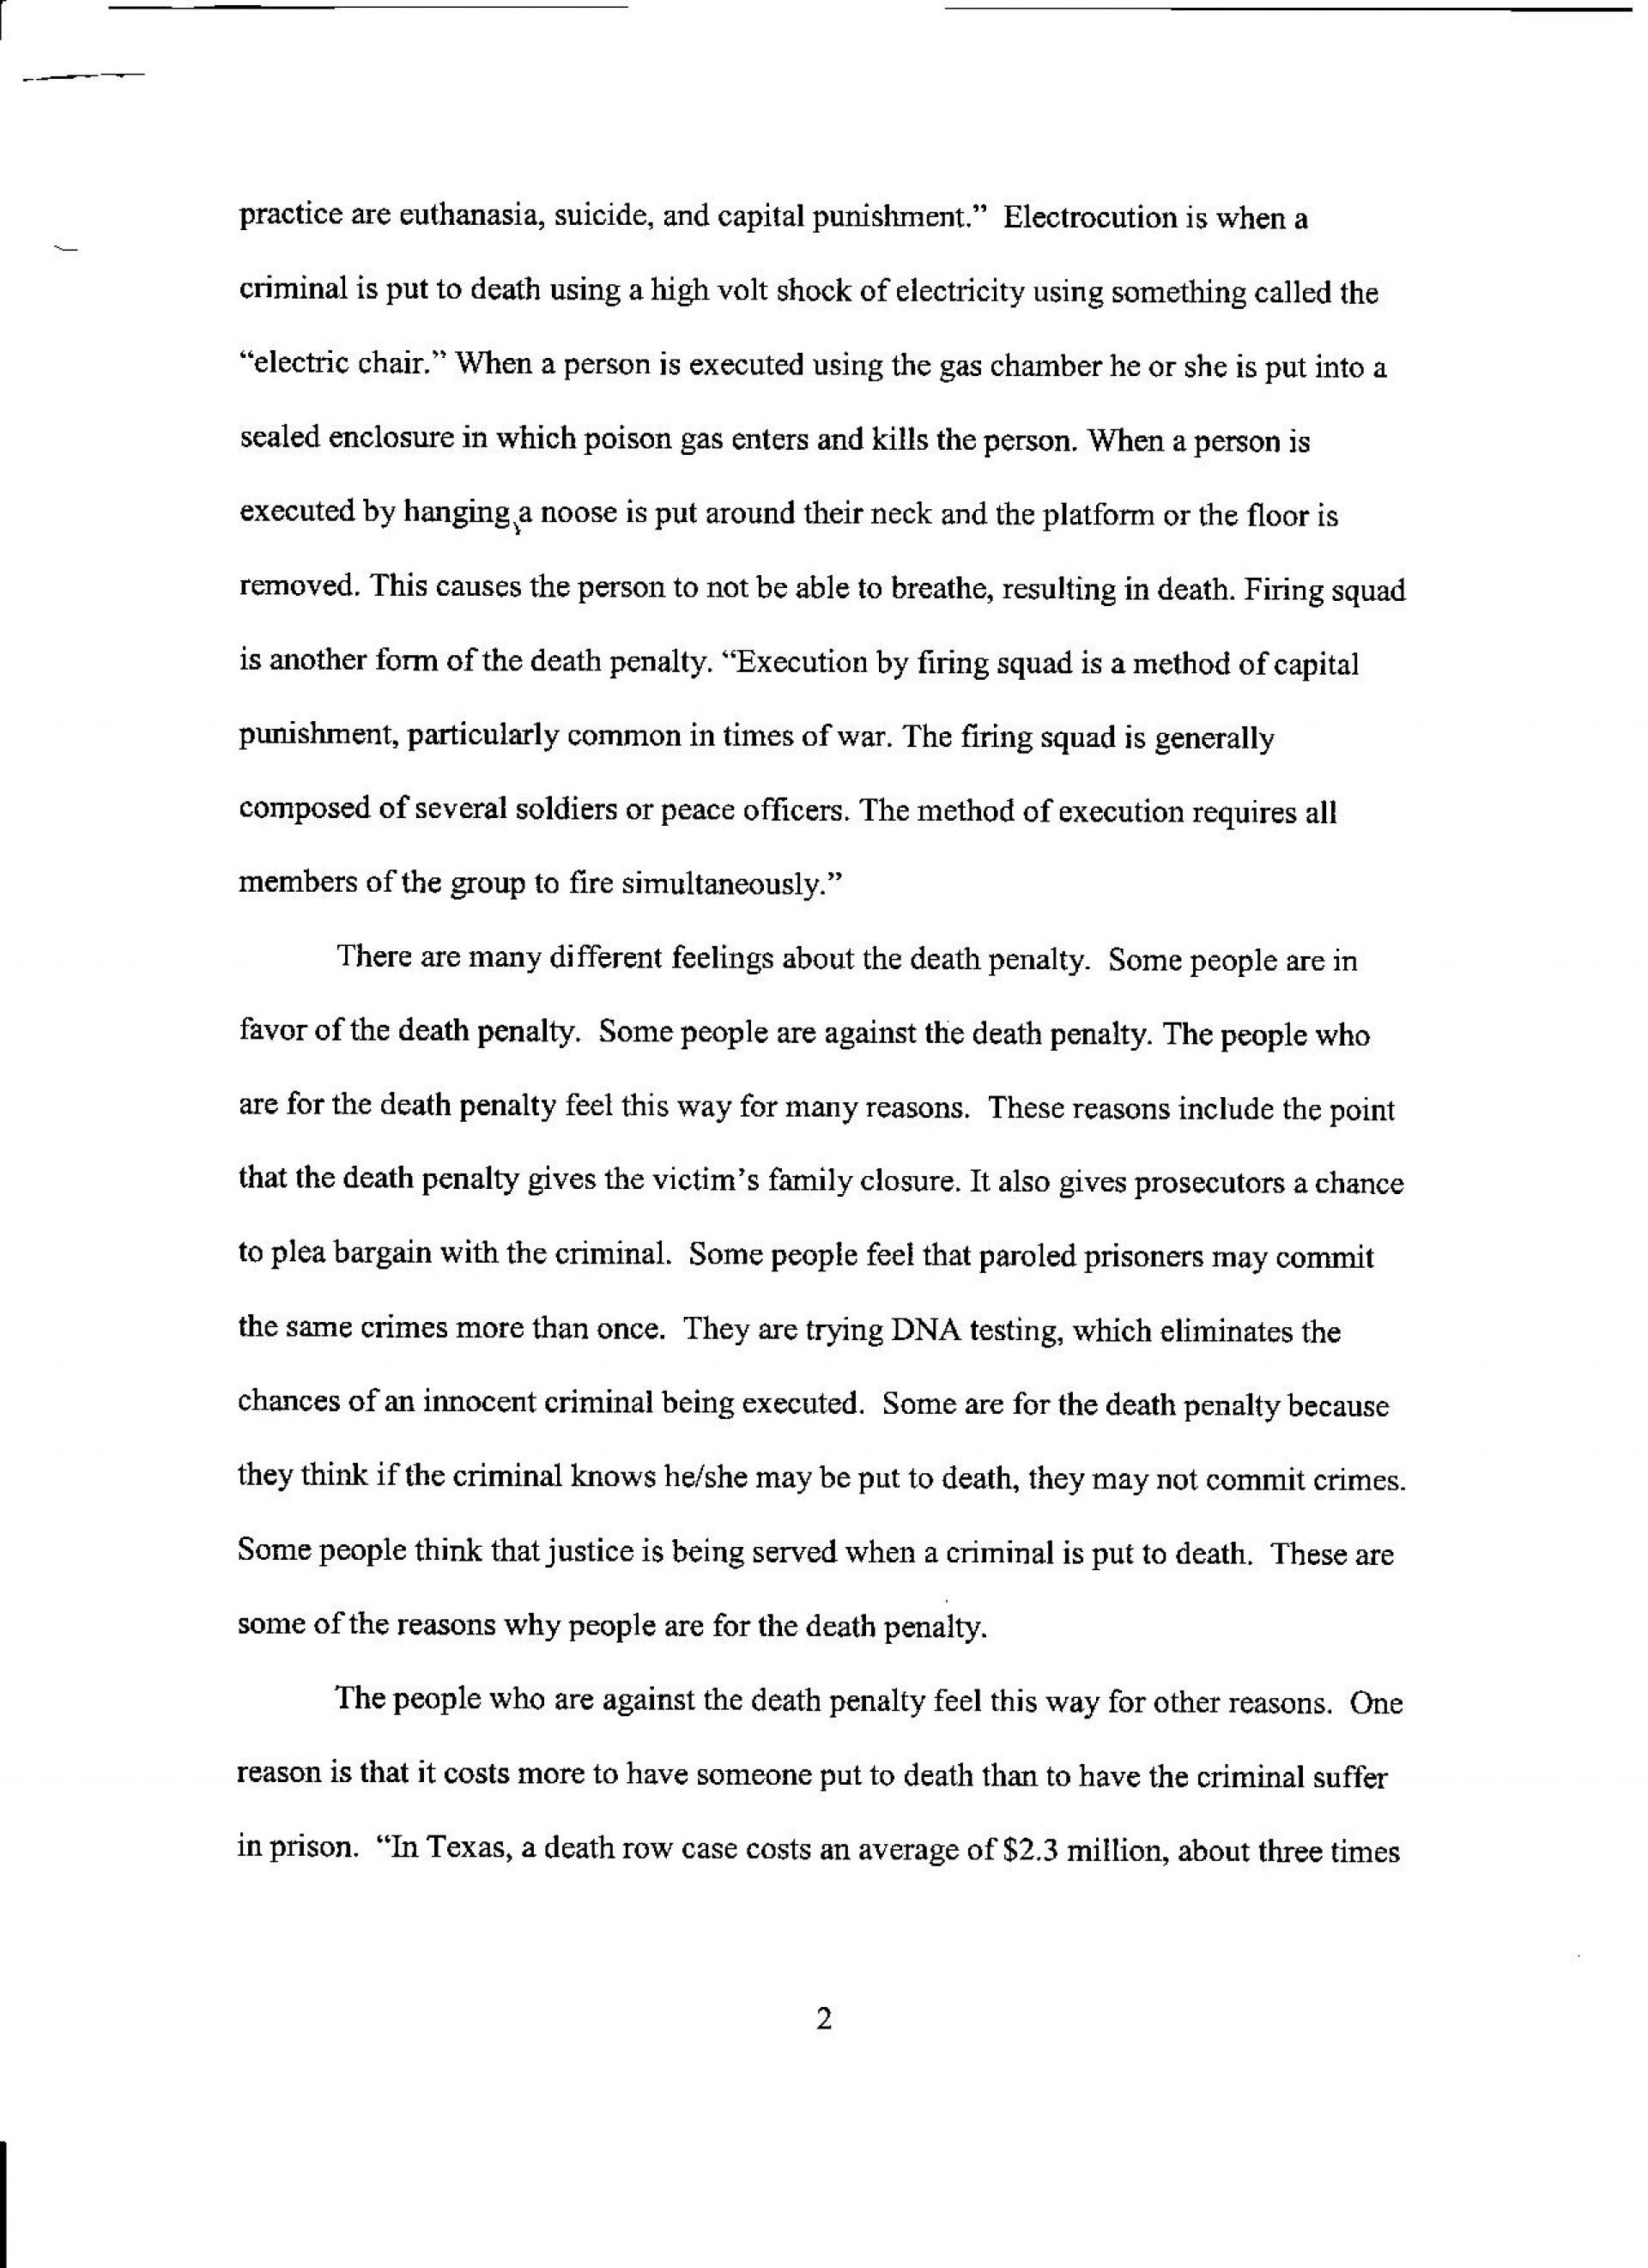 010 Death Penalty Pg Argumentative Essay Incredible Against Sample Outline 1920